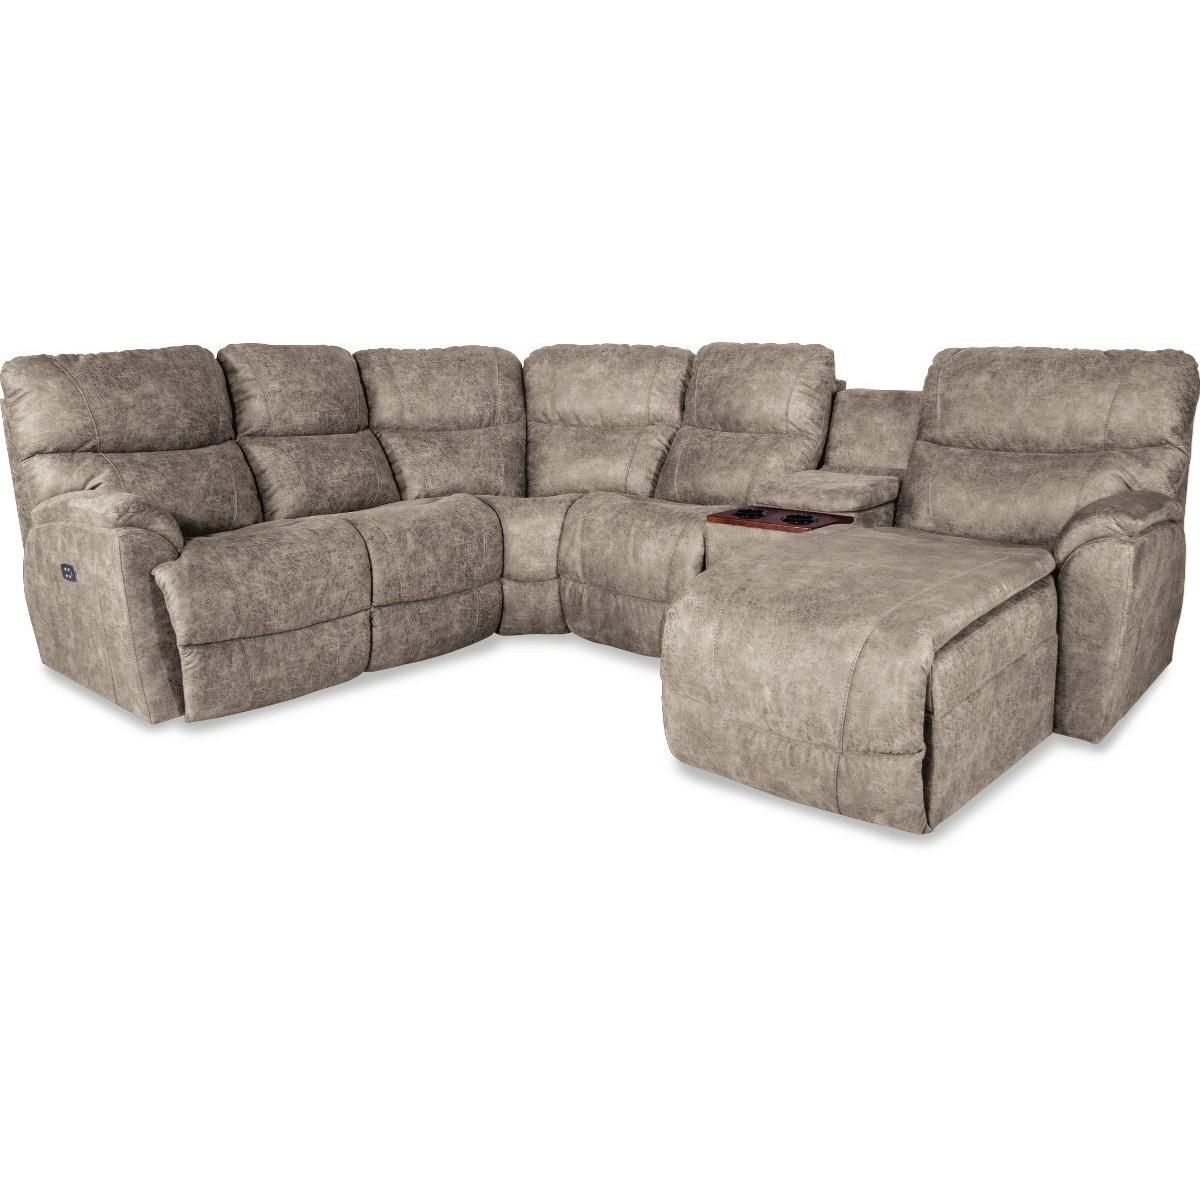 La Z Boy Trouper5 Pc Pwr Reclining Sofa W/ LAS Chaise